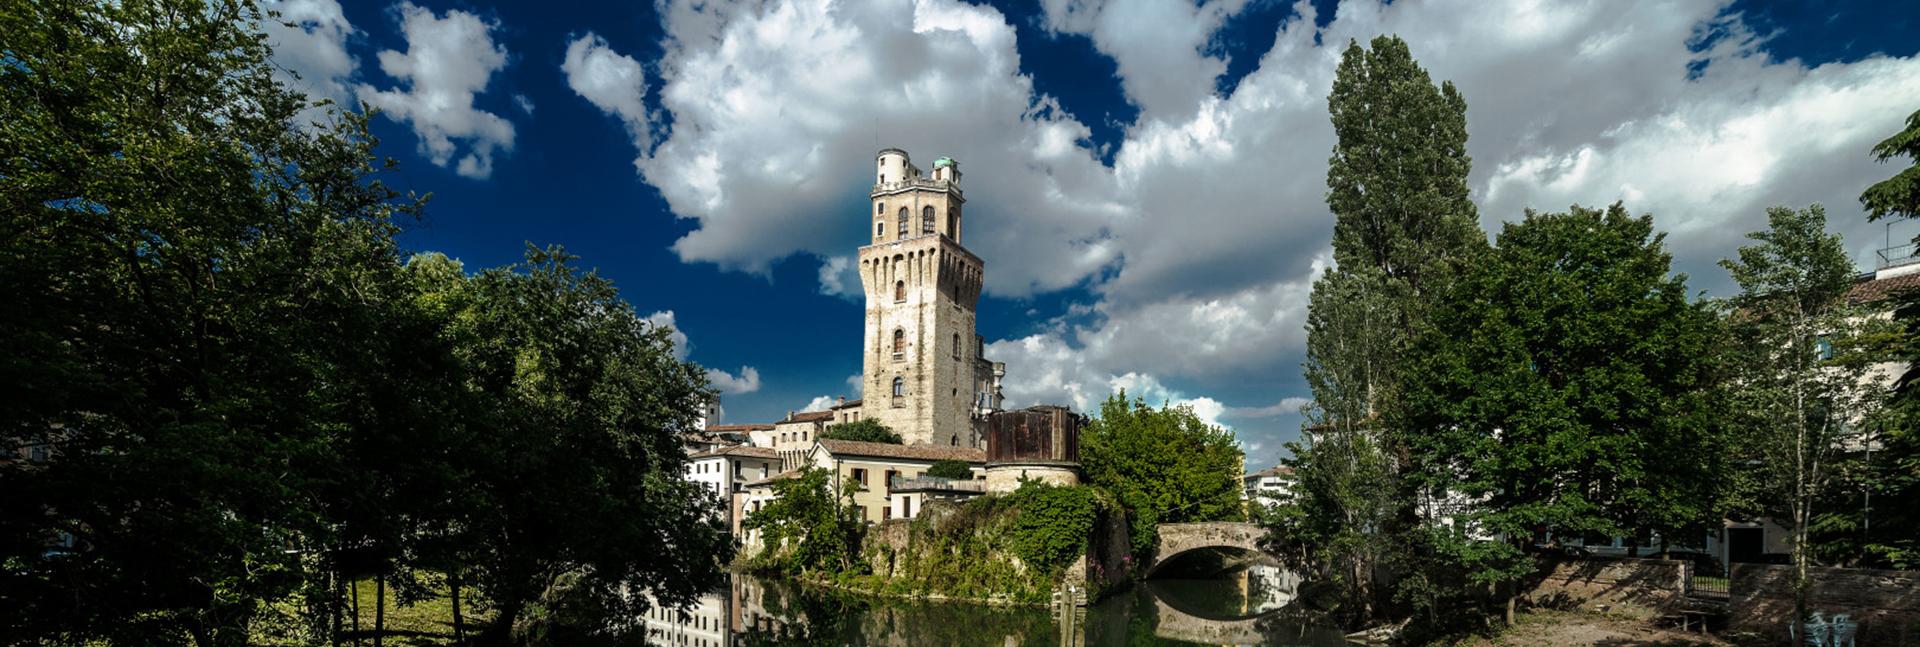 Padova Travel Vie d'acqua ©Valter Berton